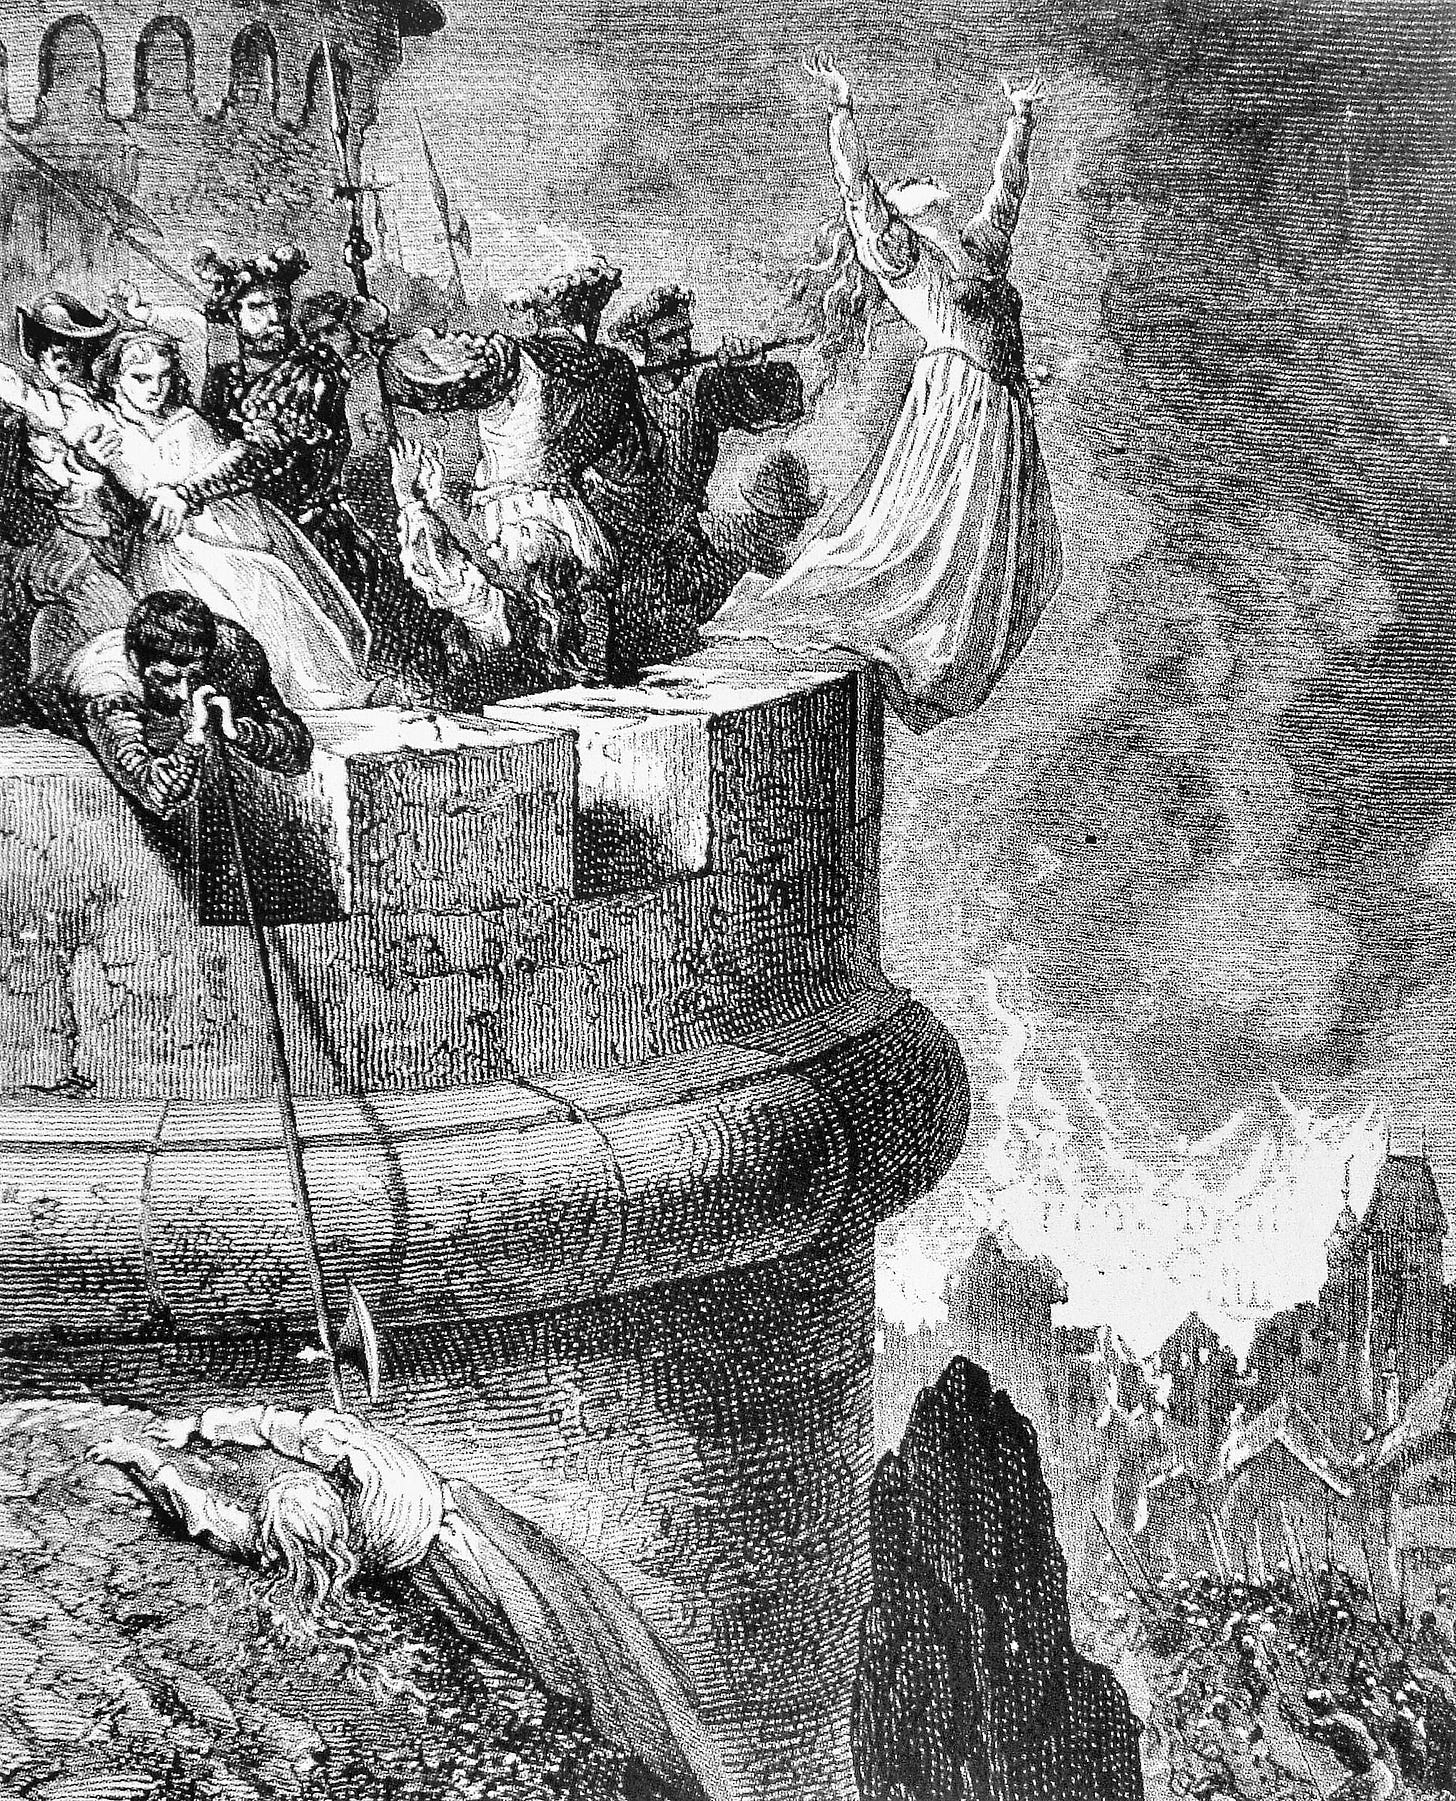 Mérindol massacre - Wikipedia